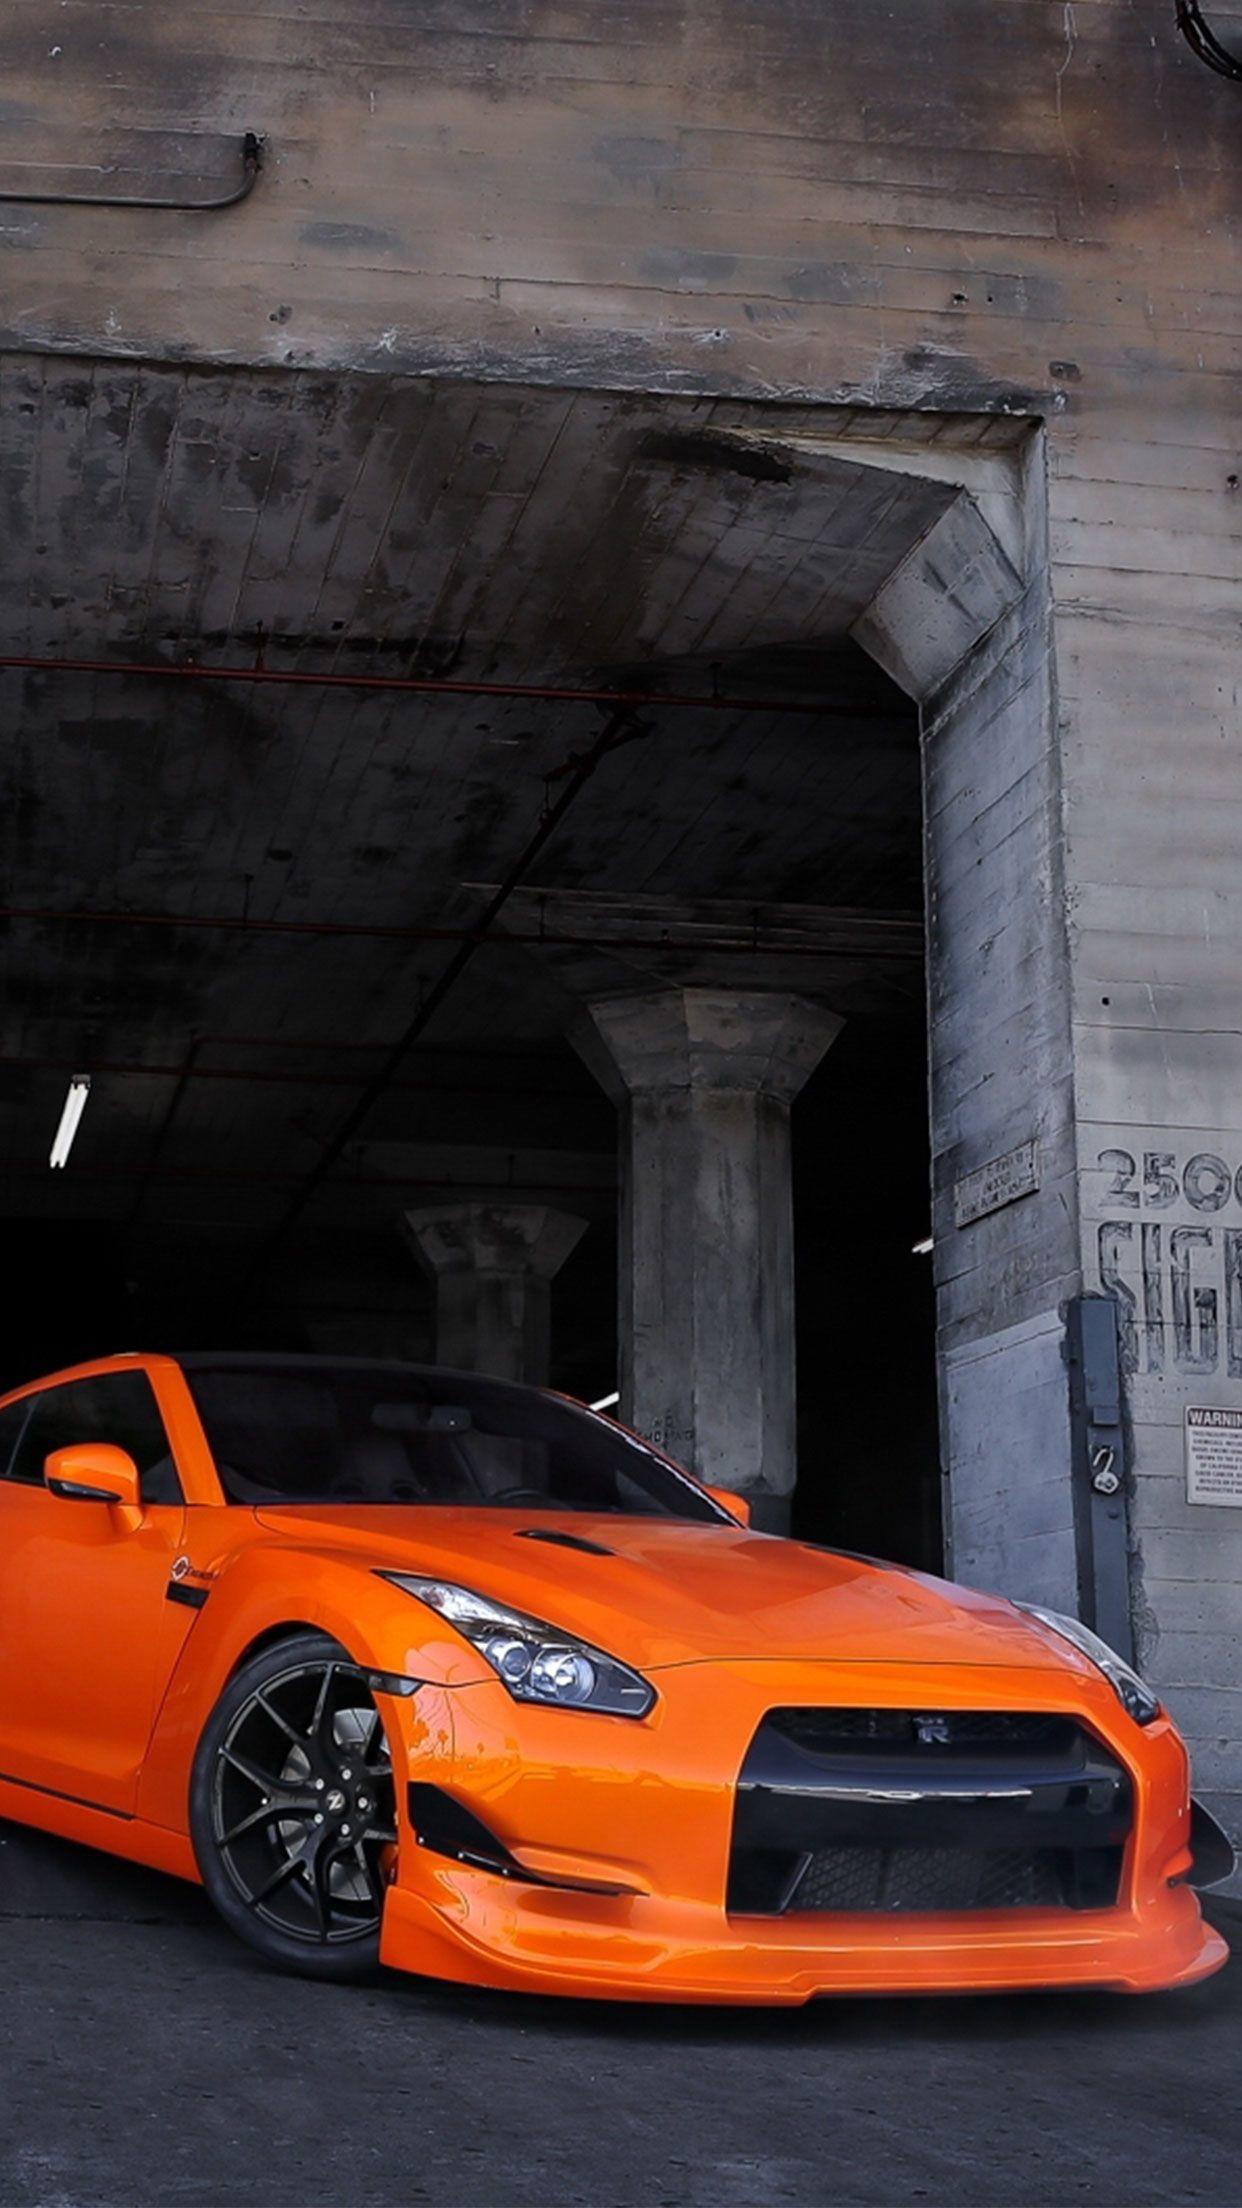 Iphone Car Wallpaper 88 Images